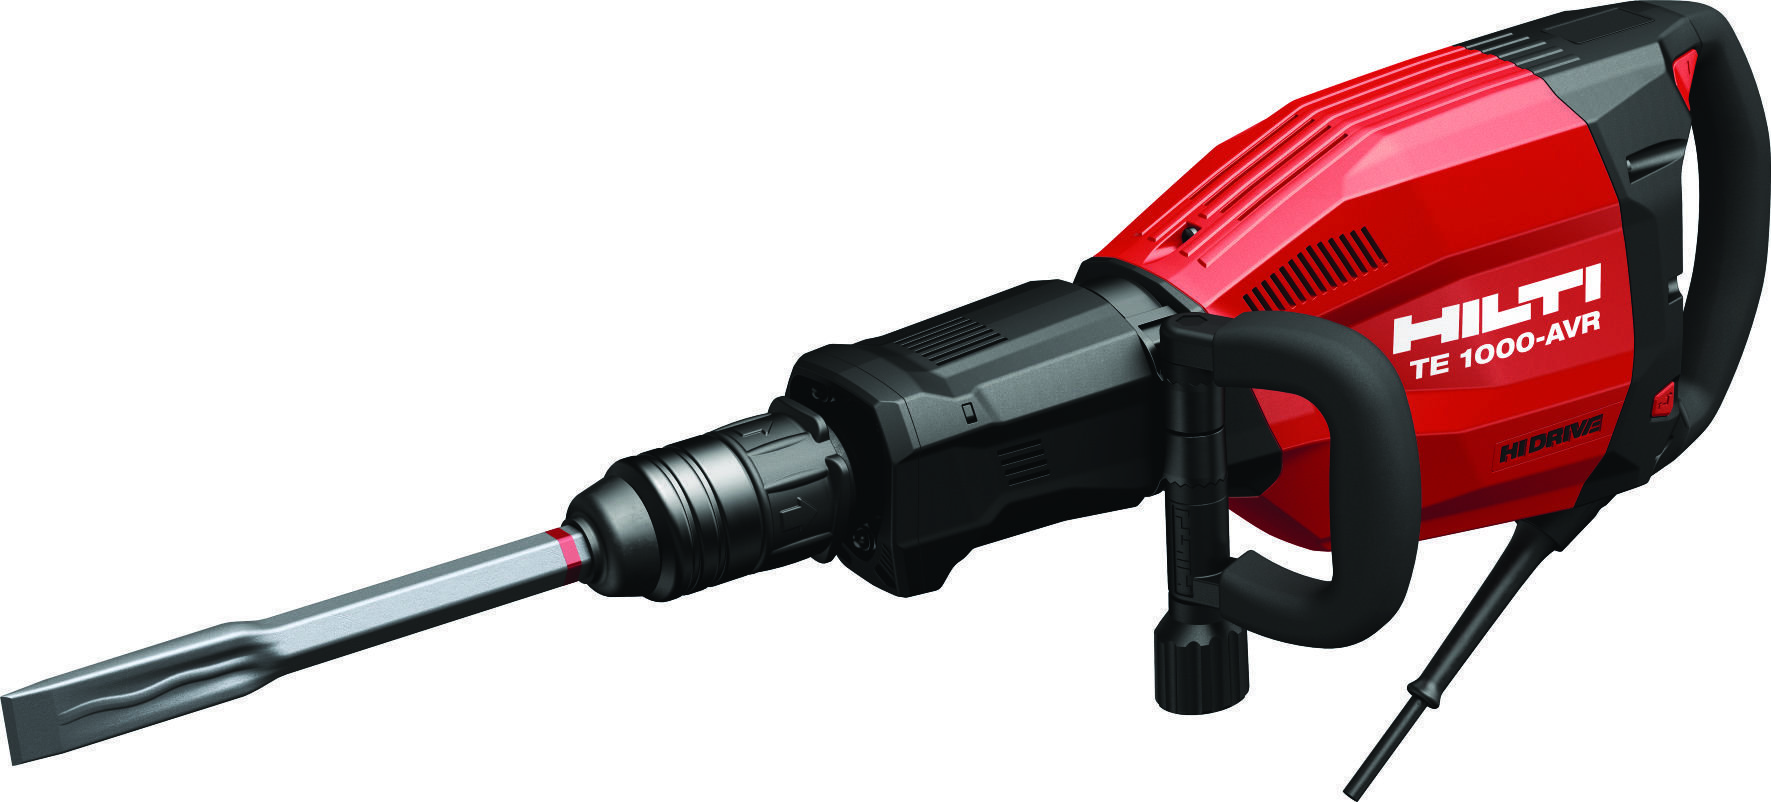 Hilti - TE 1000-AVR Demo Hammer 00006